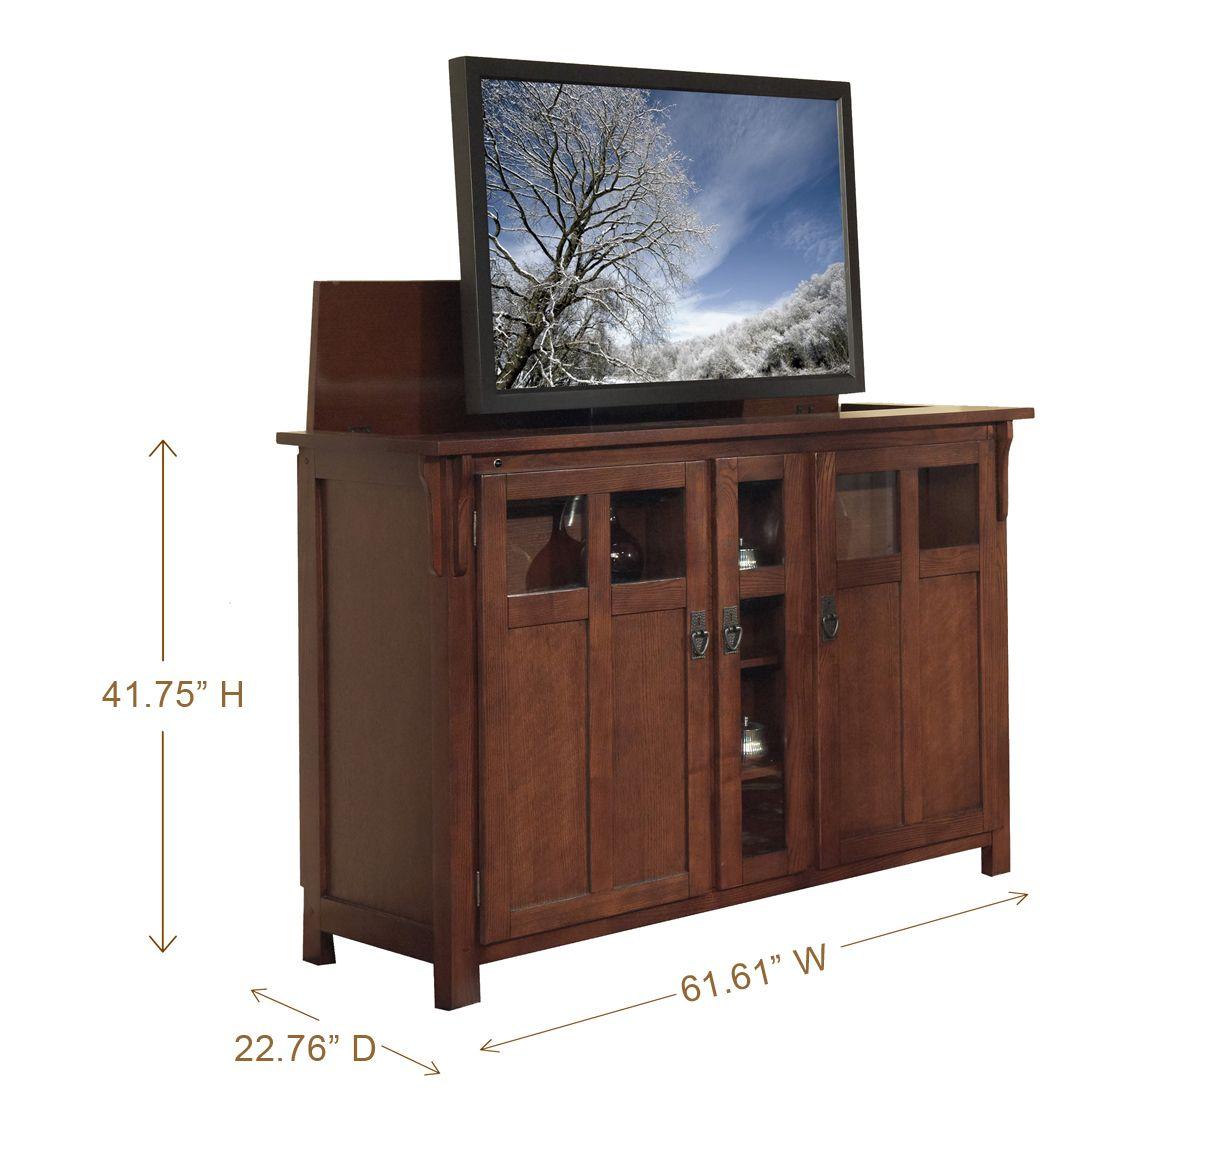 Bungalow Mission Oak Tv Lift Cabinet Www Touchstonehomeproduts Com Tv Lift Cabinet